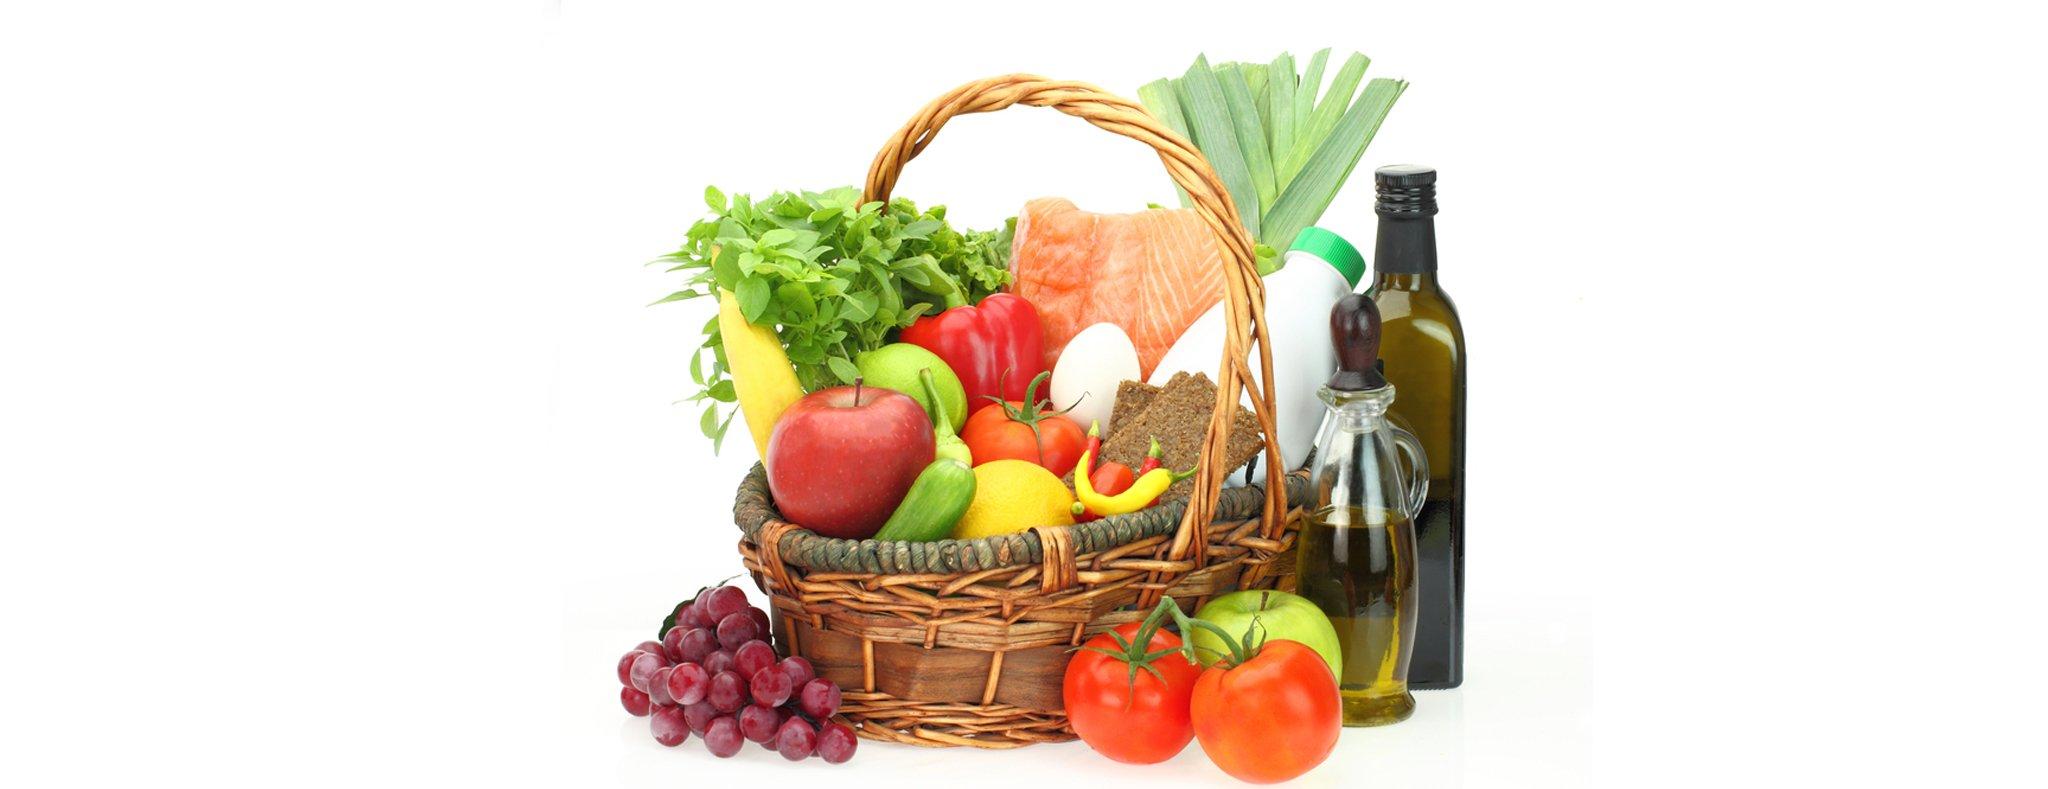 Mediterranean What to Eat